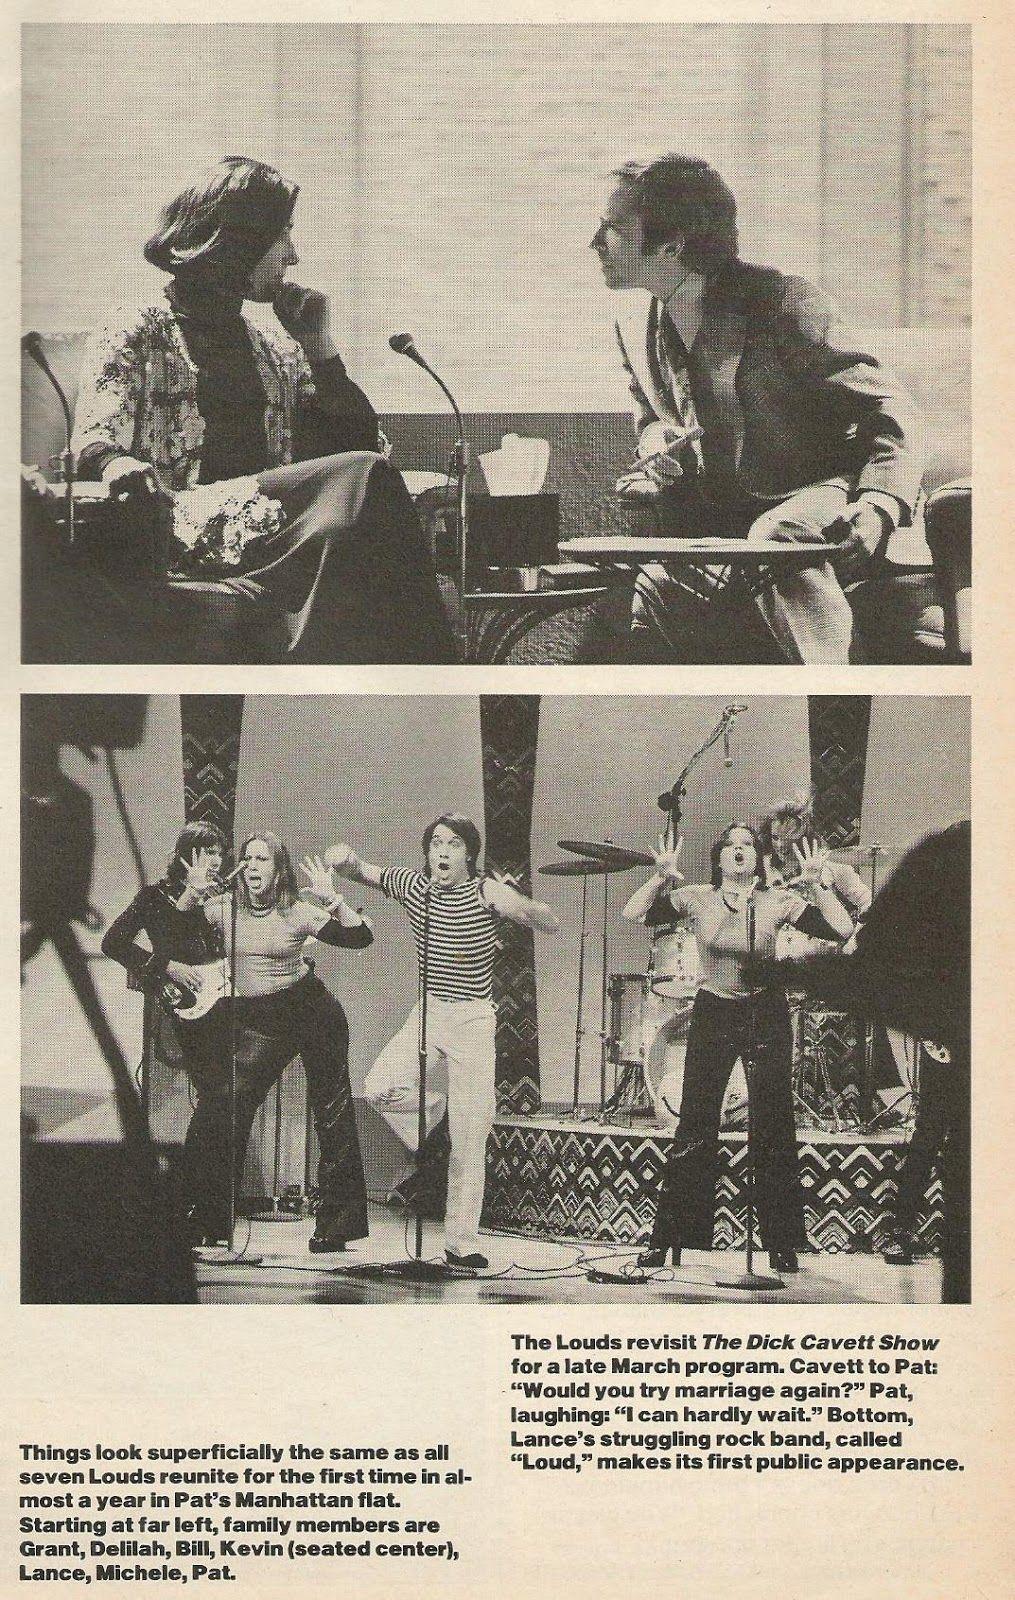 Waitakere Walks: The Snoop Sisters and Alice Cooper/People Magazine March 4, 1974/Lance Loud & Dennis Wilson